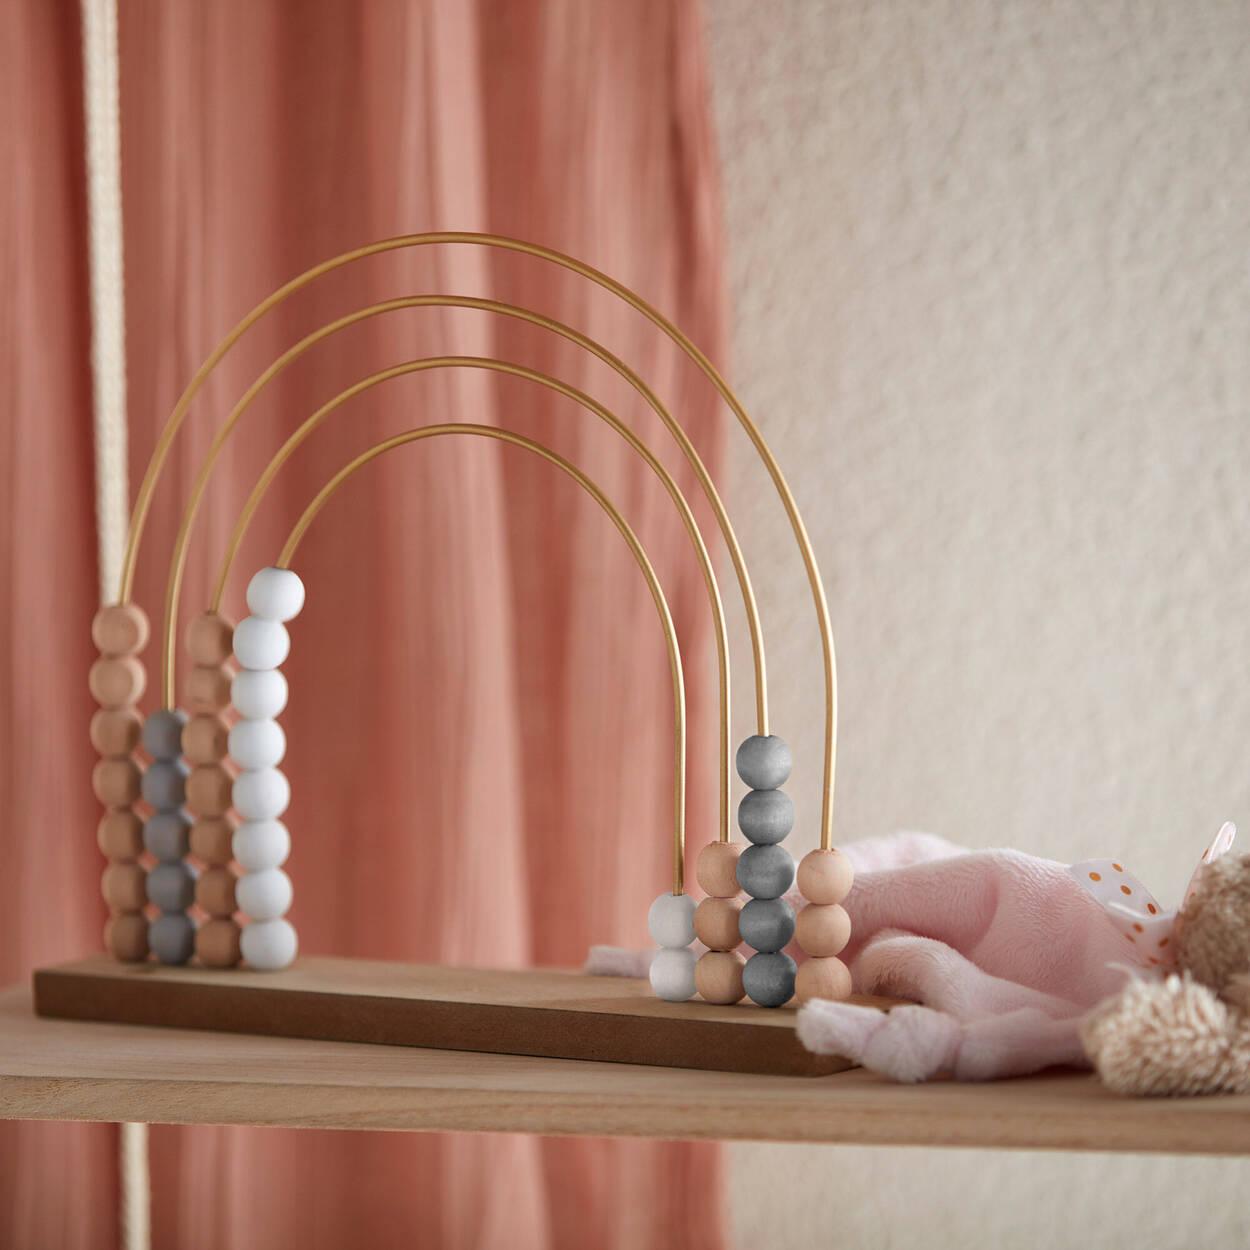 Decorative Wooden Rainbow Abacus